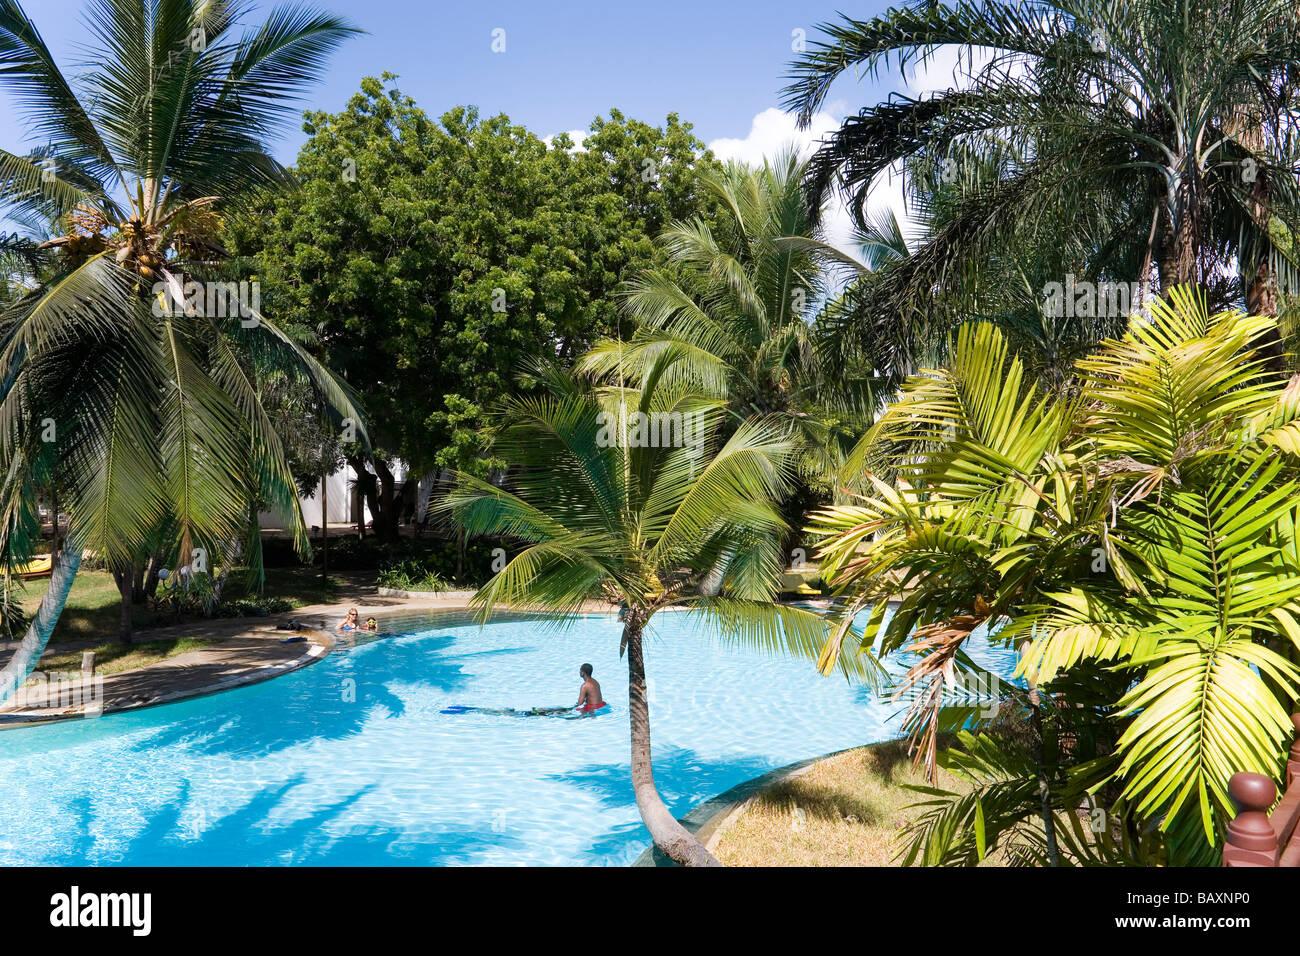 Guests bathing in the swimming pool, Sarova Whitesands Beach Resort and Spa, Shanzu Beach, Coast, Kenya - Stock Image